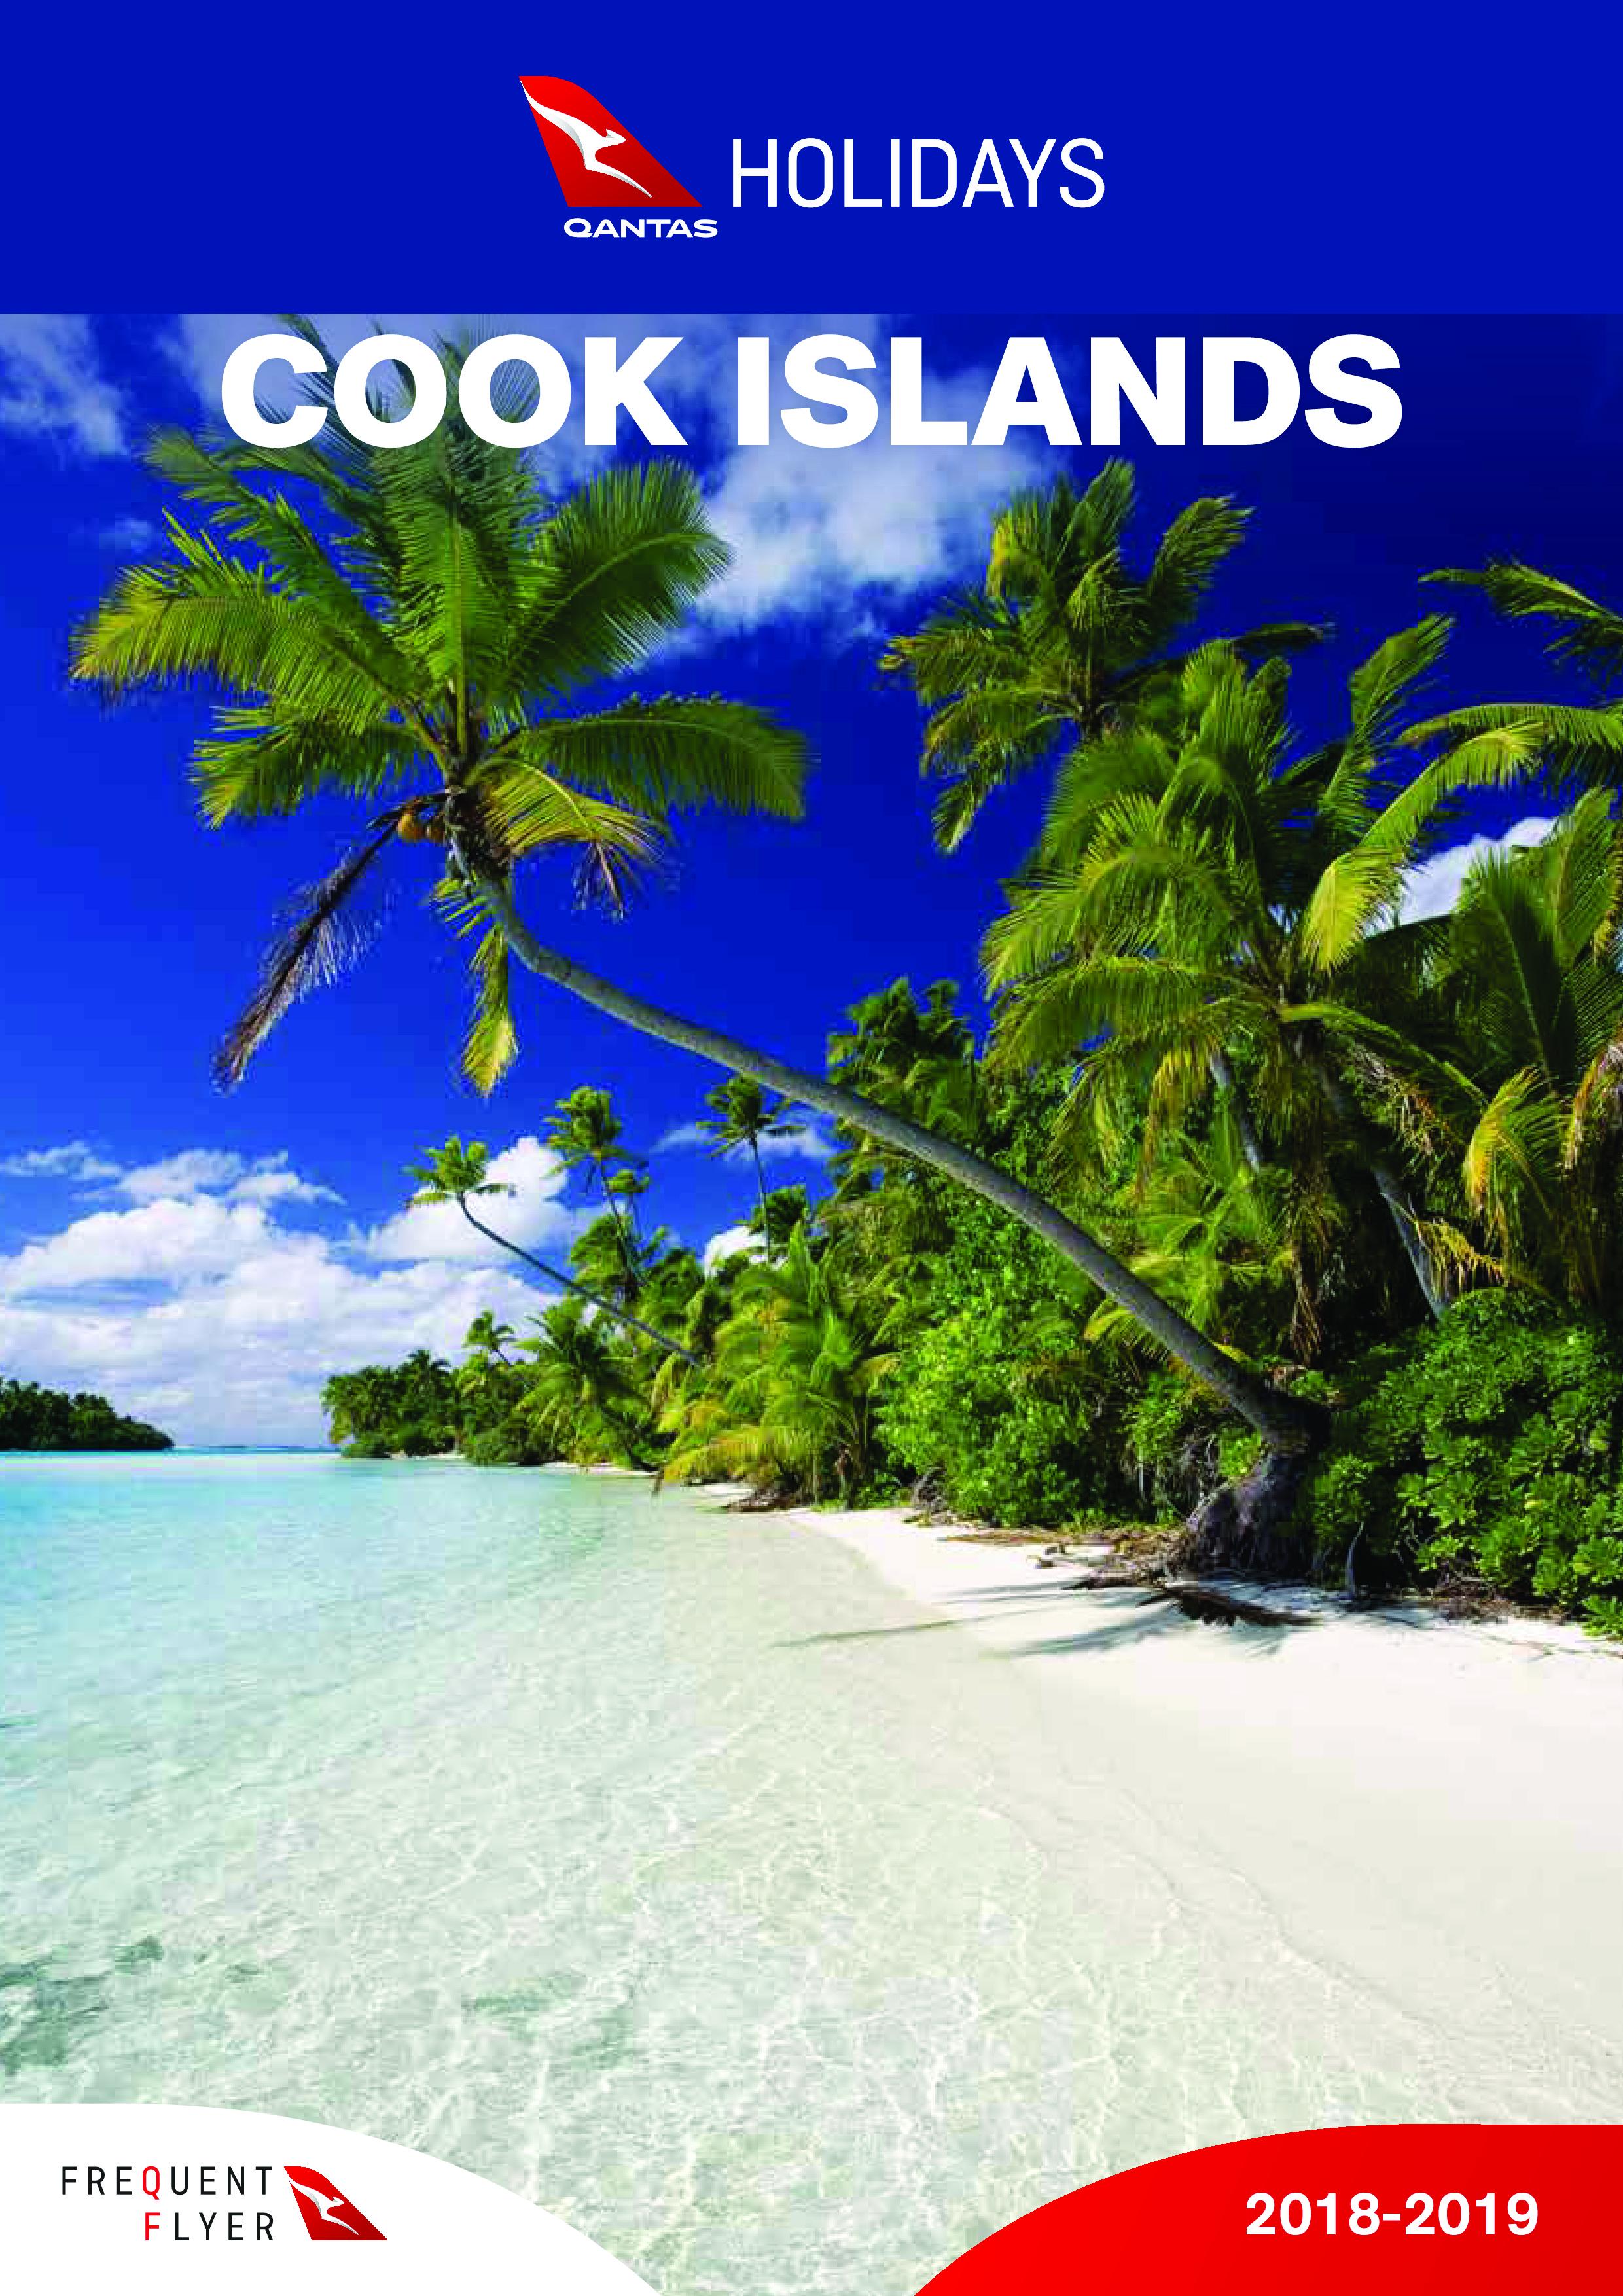 COOK ISLANDS-page-0.jpg